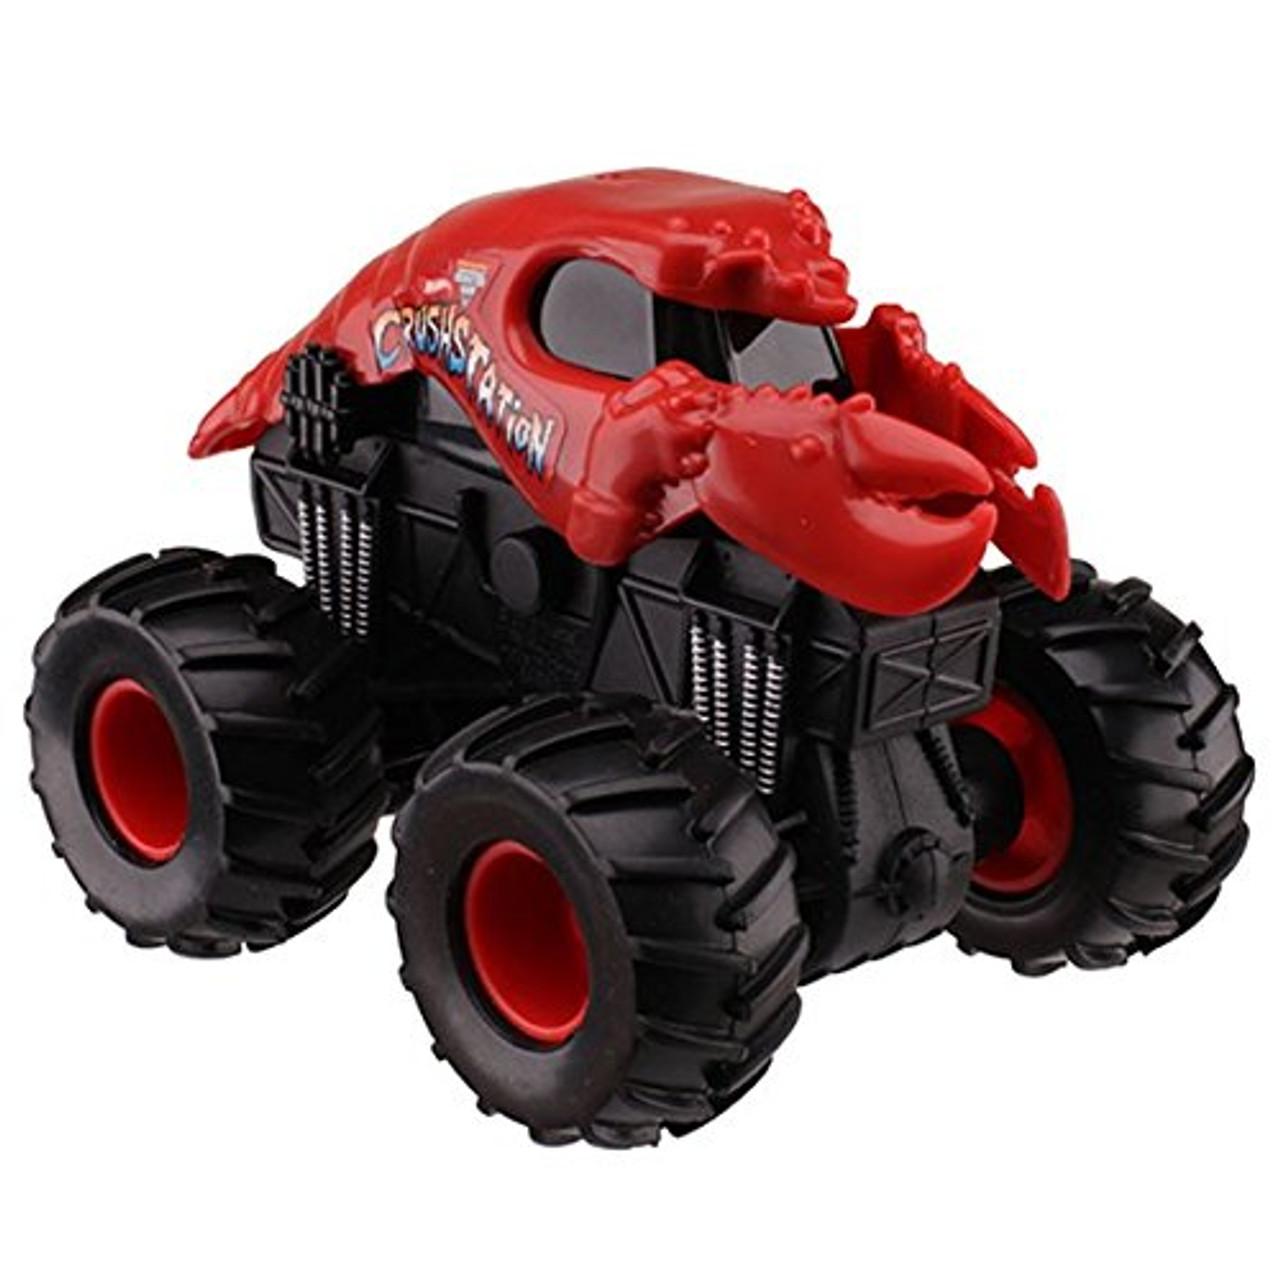 Hot Wheels Monster Jam Playmat includes 3 Trucks